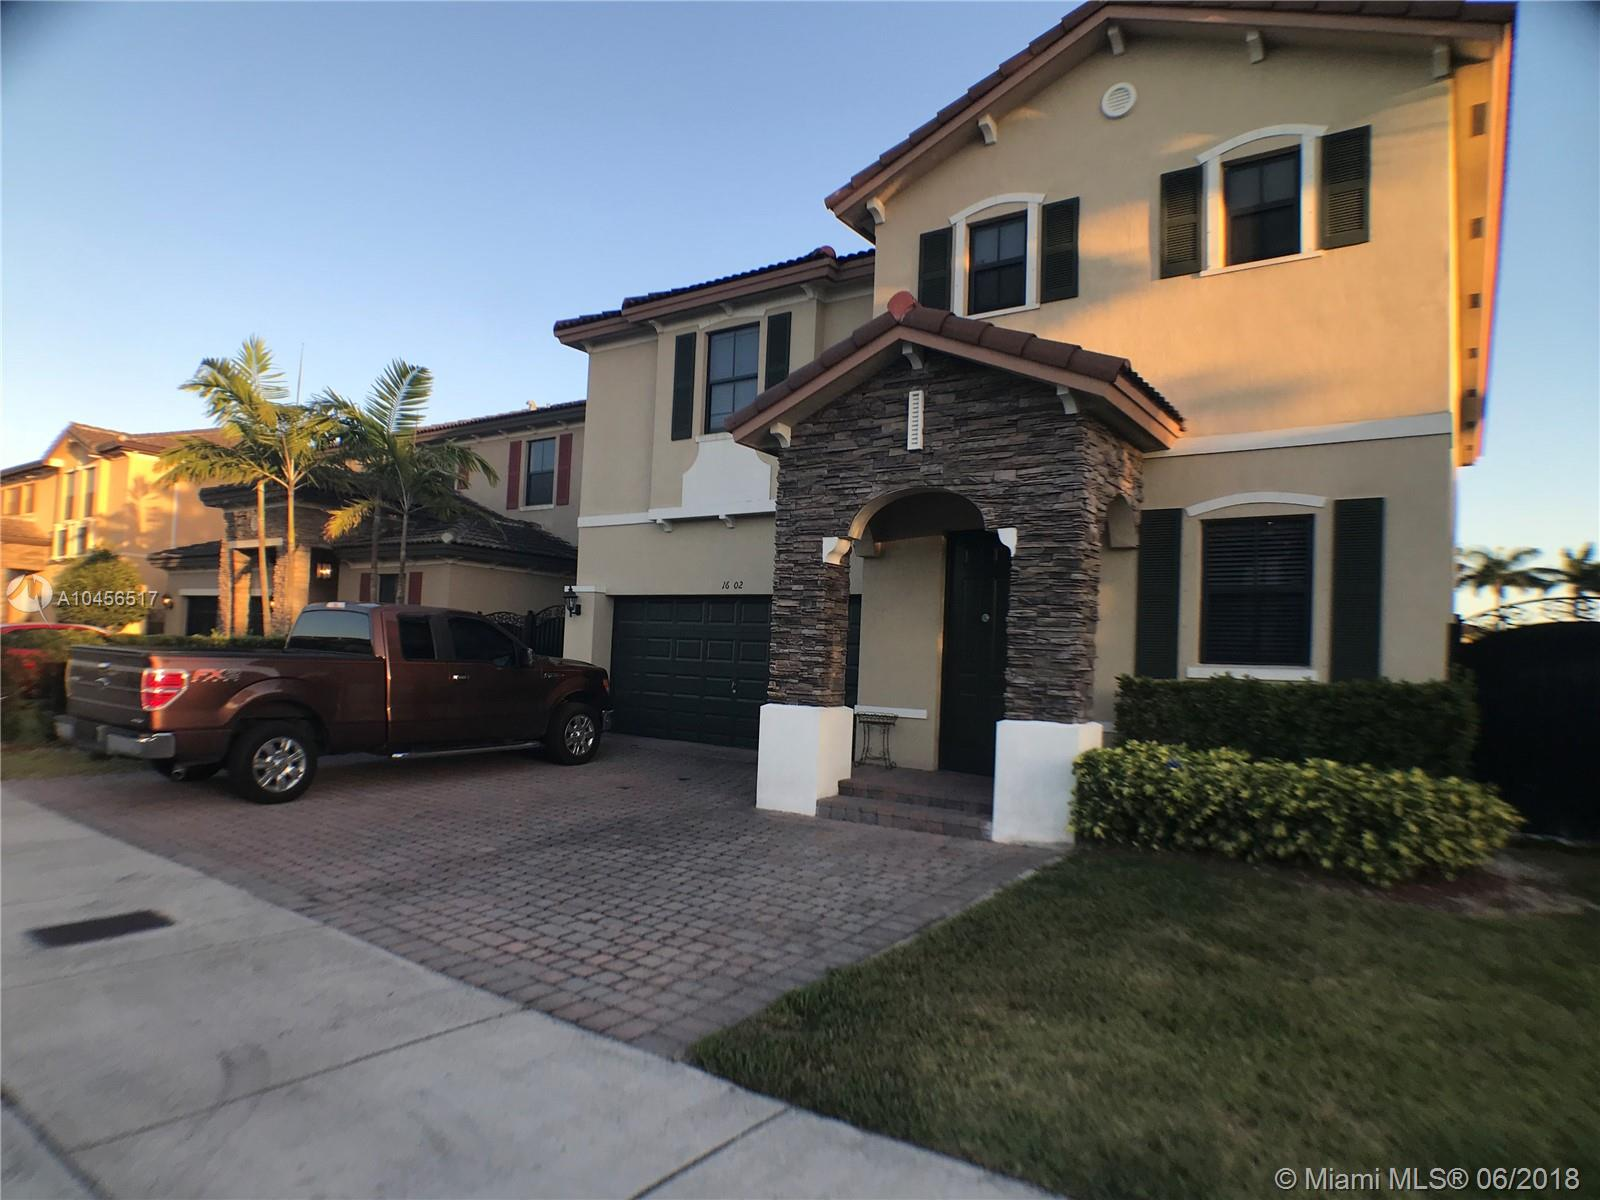 16602 Sw 43rd St, Miami FL, 33185